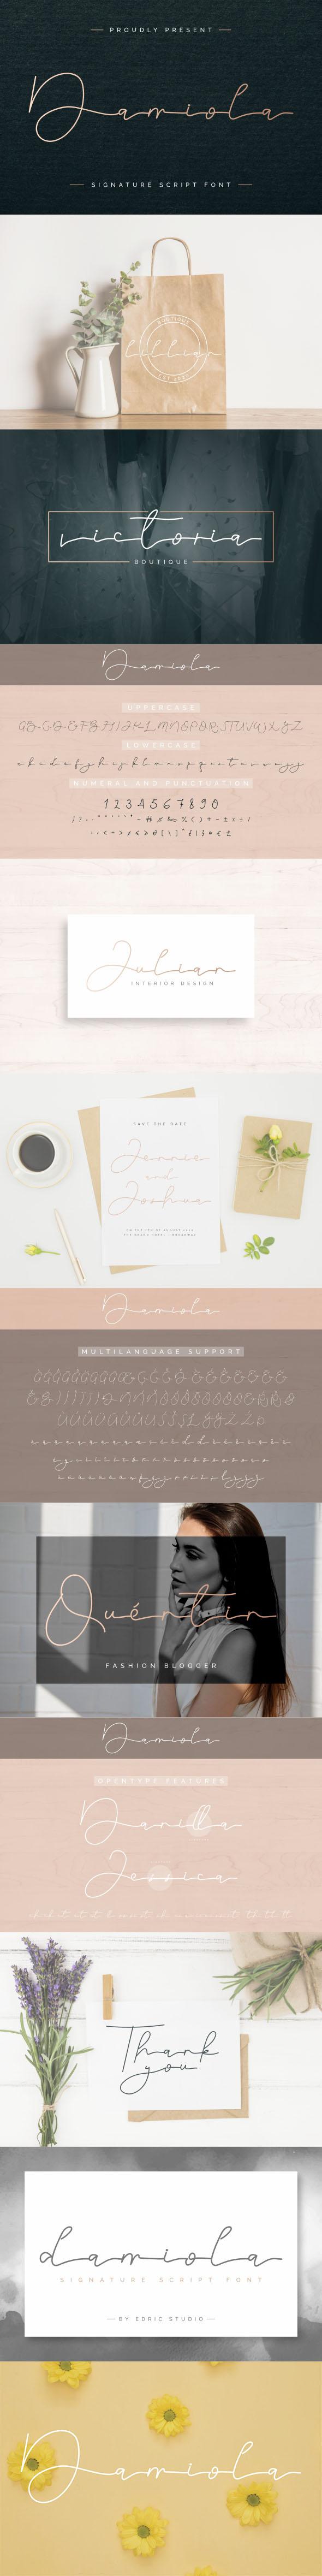 Damiola Handwriting Font